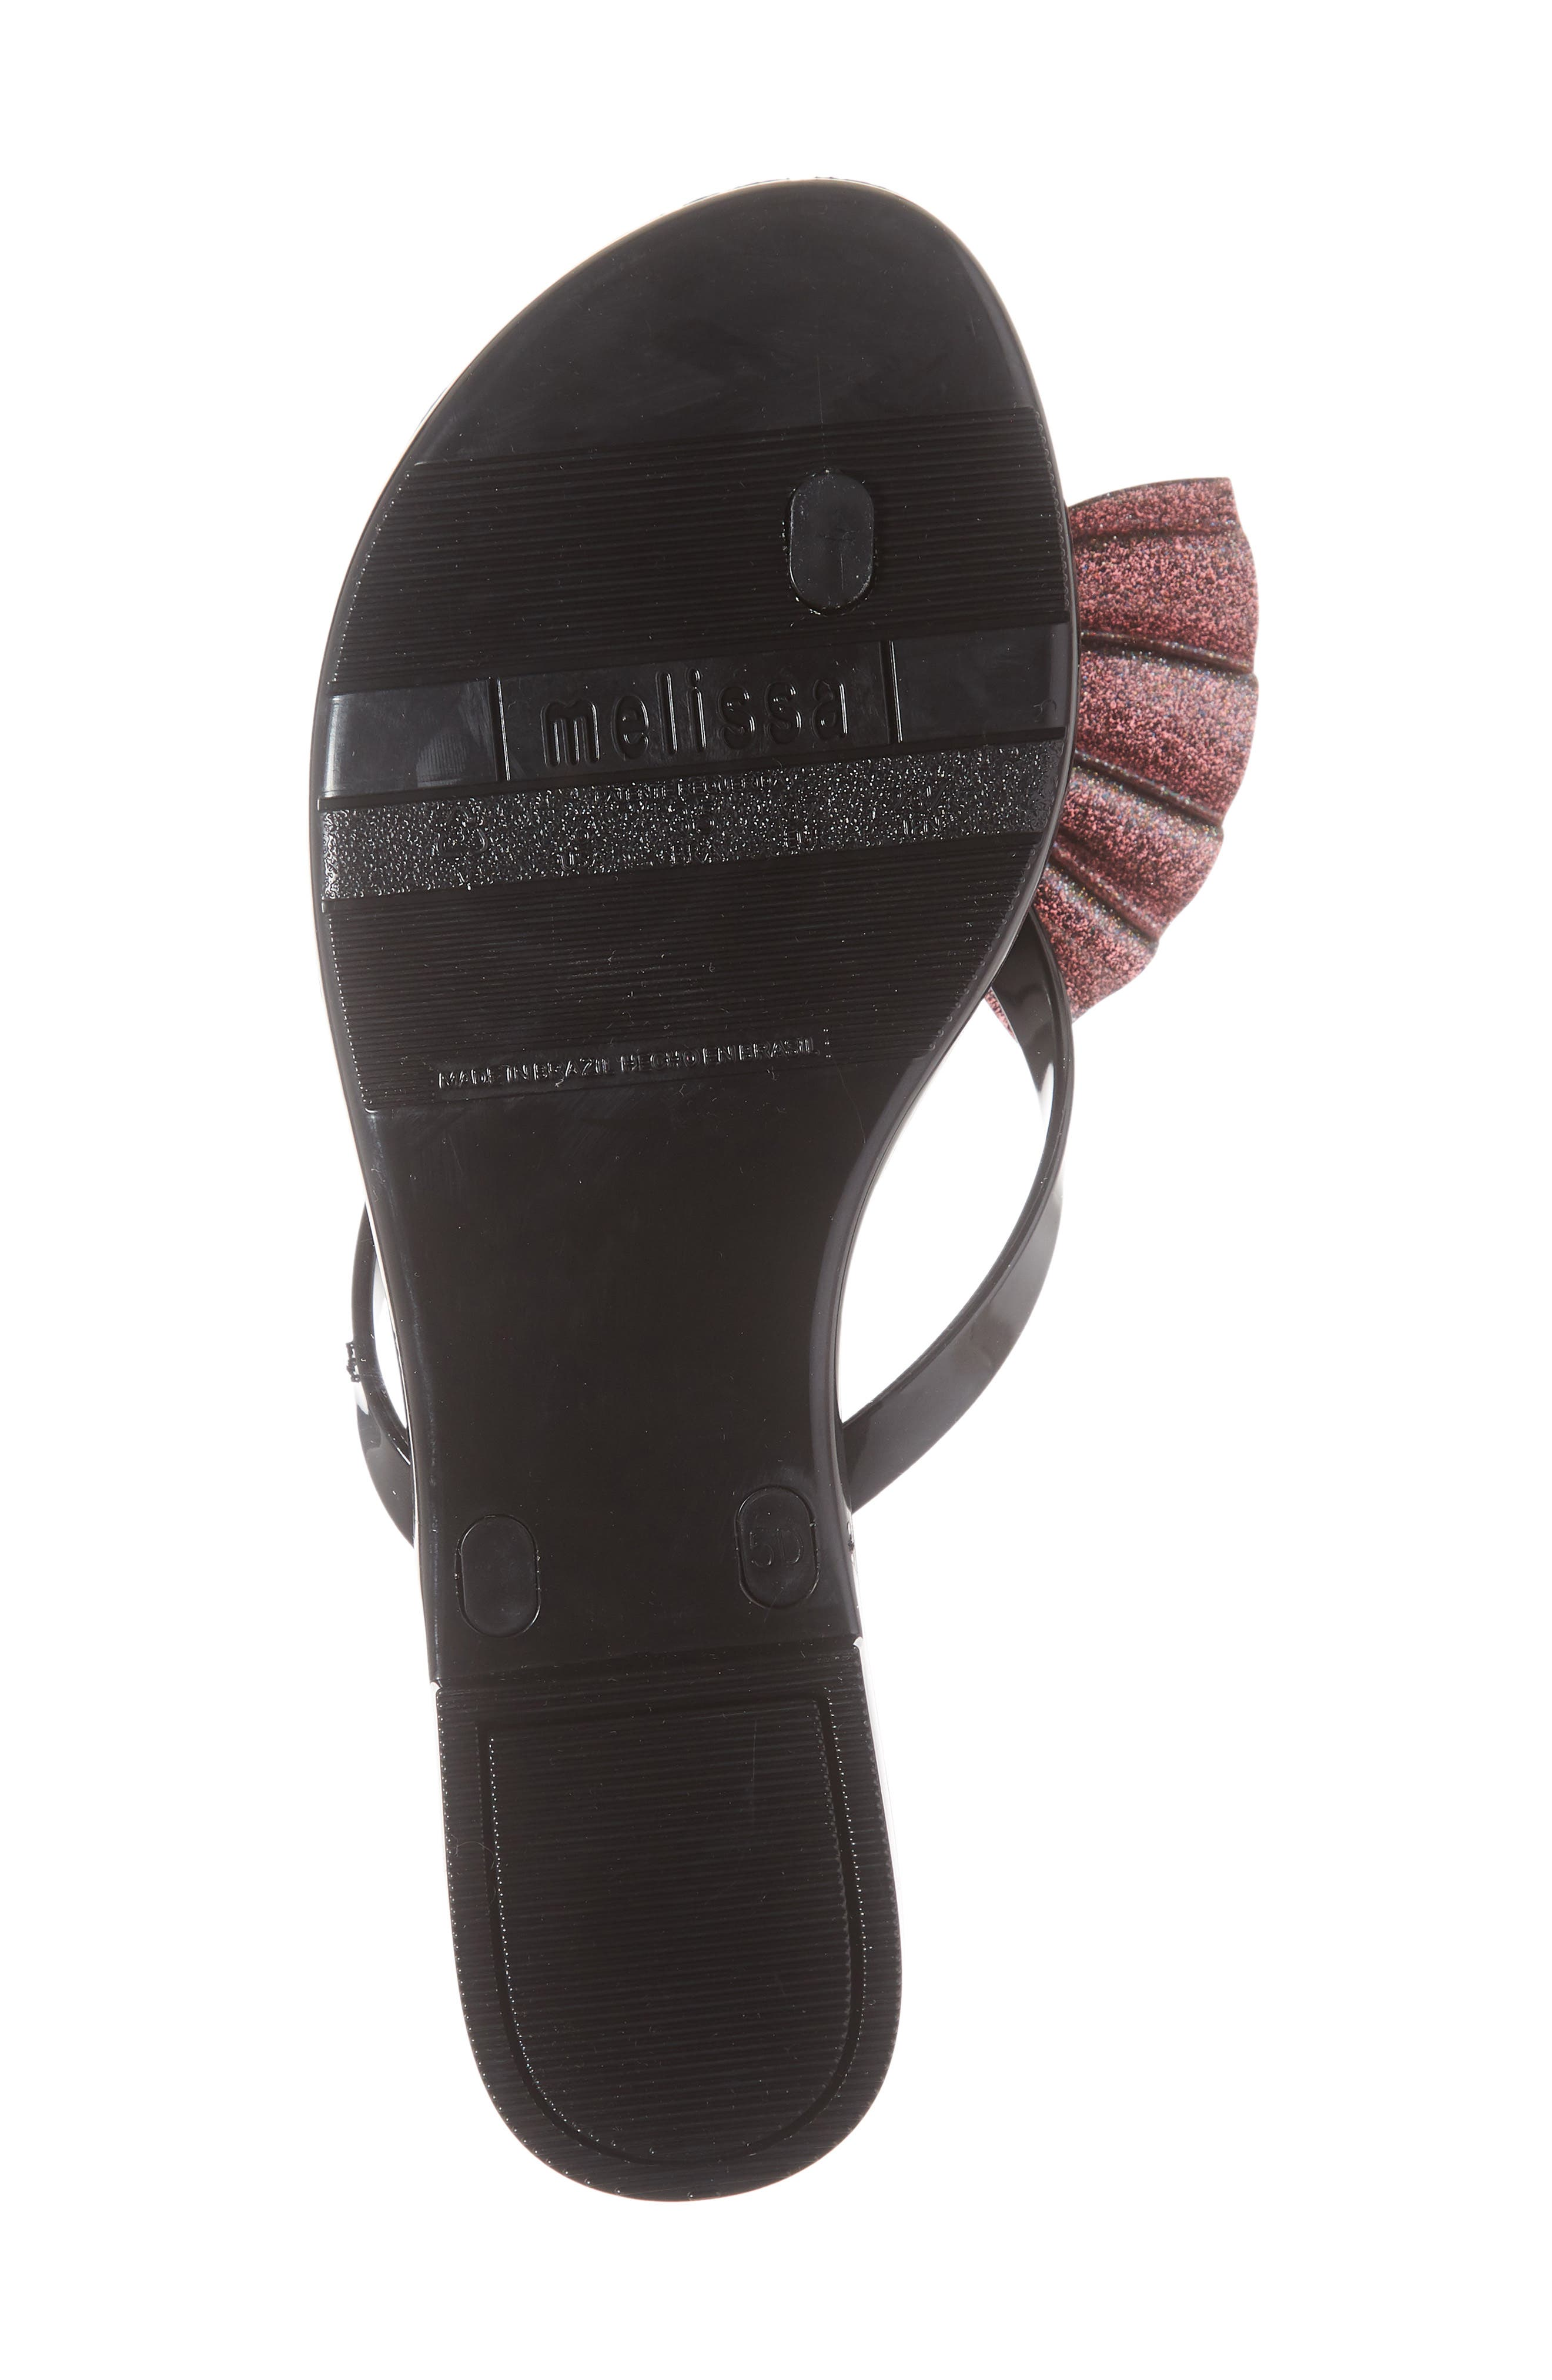 Harmonic Bow VI Flip Flop,                             Alternate thumbnail 6, color,                             BLACK GLITTER RUBBER